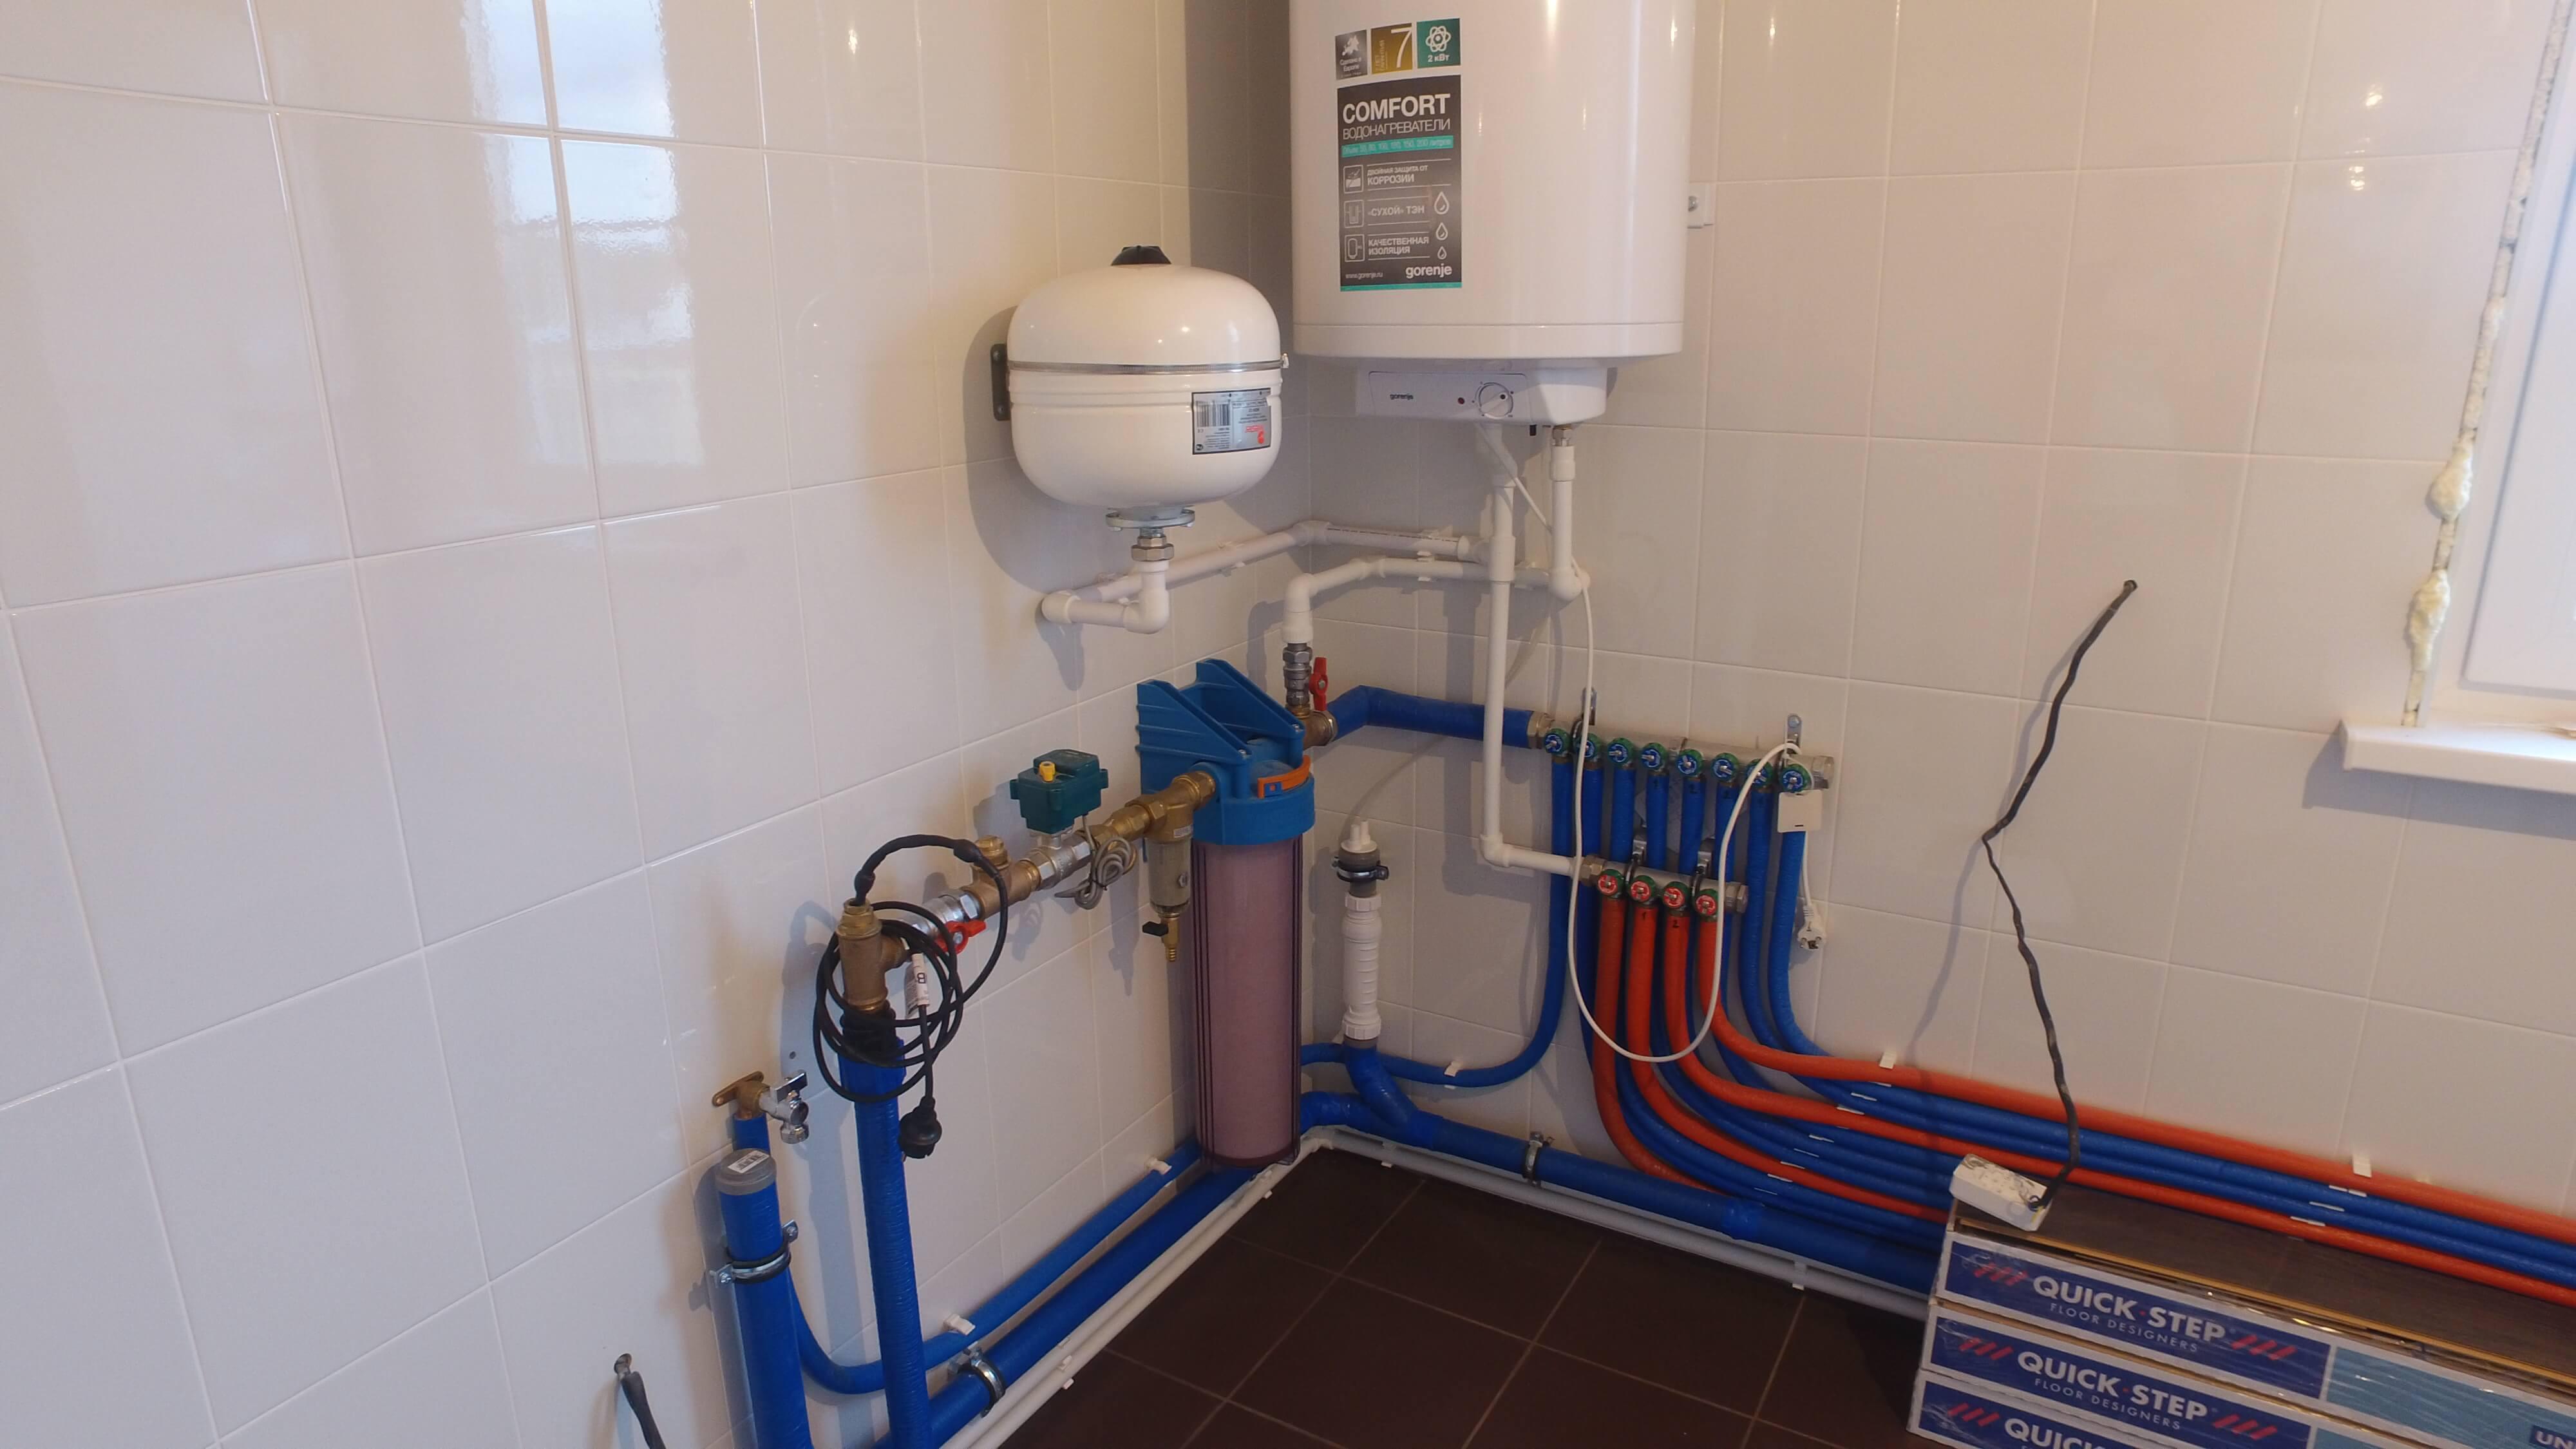 Система отопления и водоснабжения